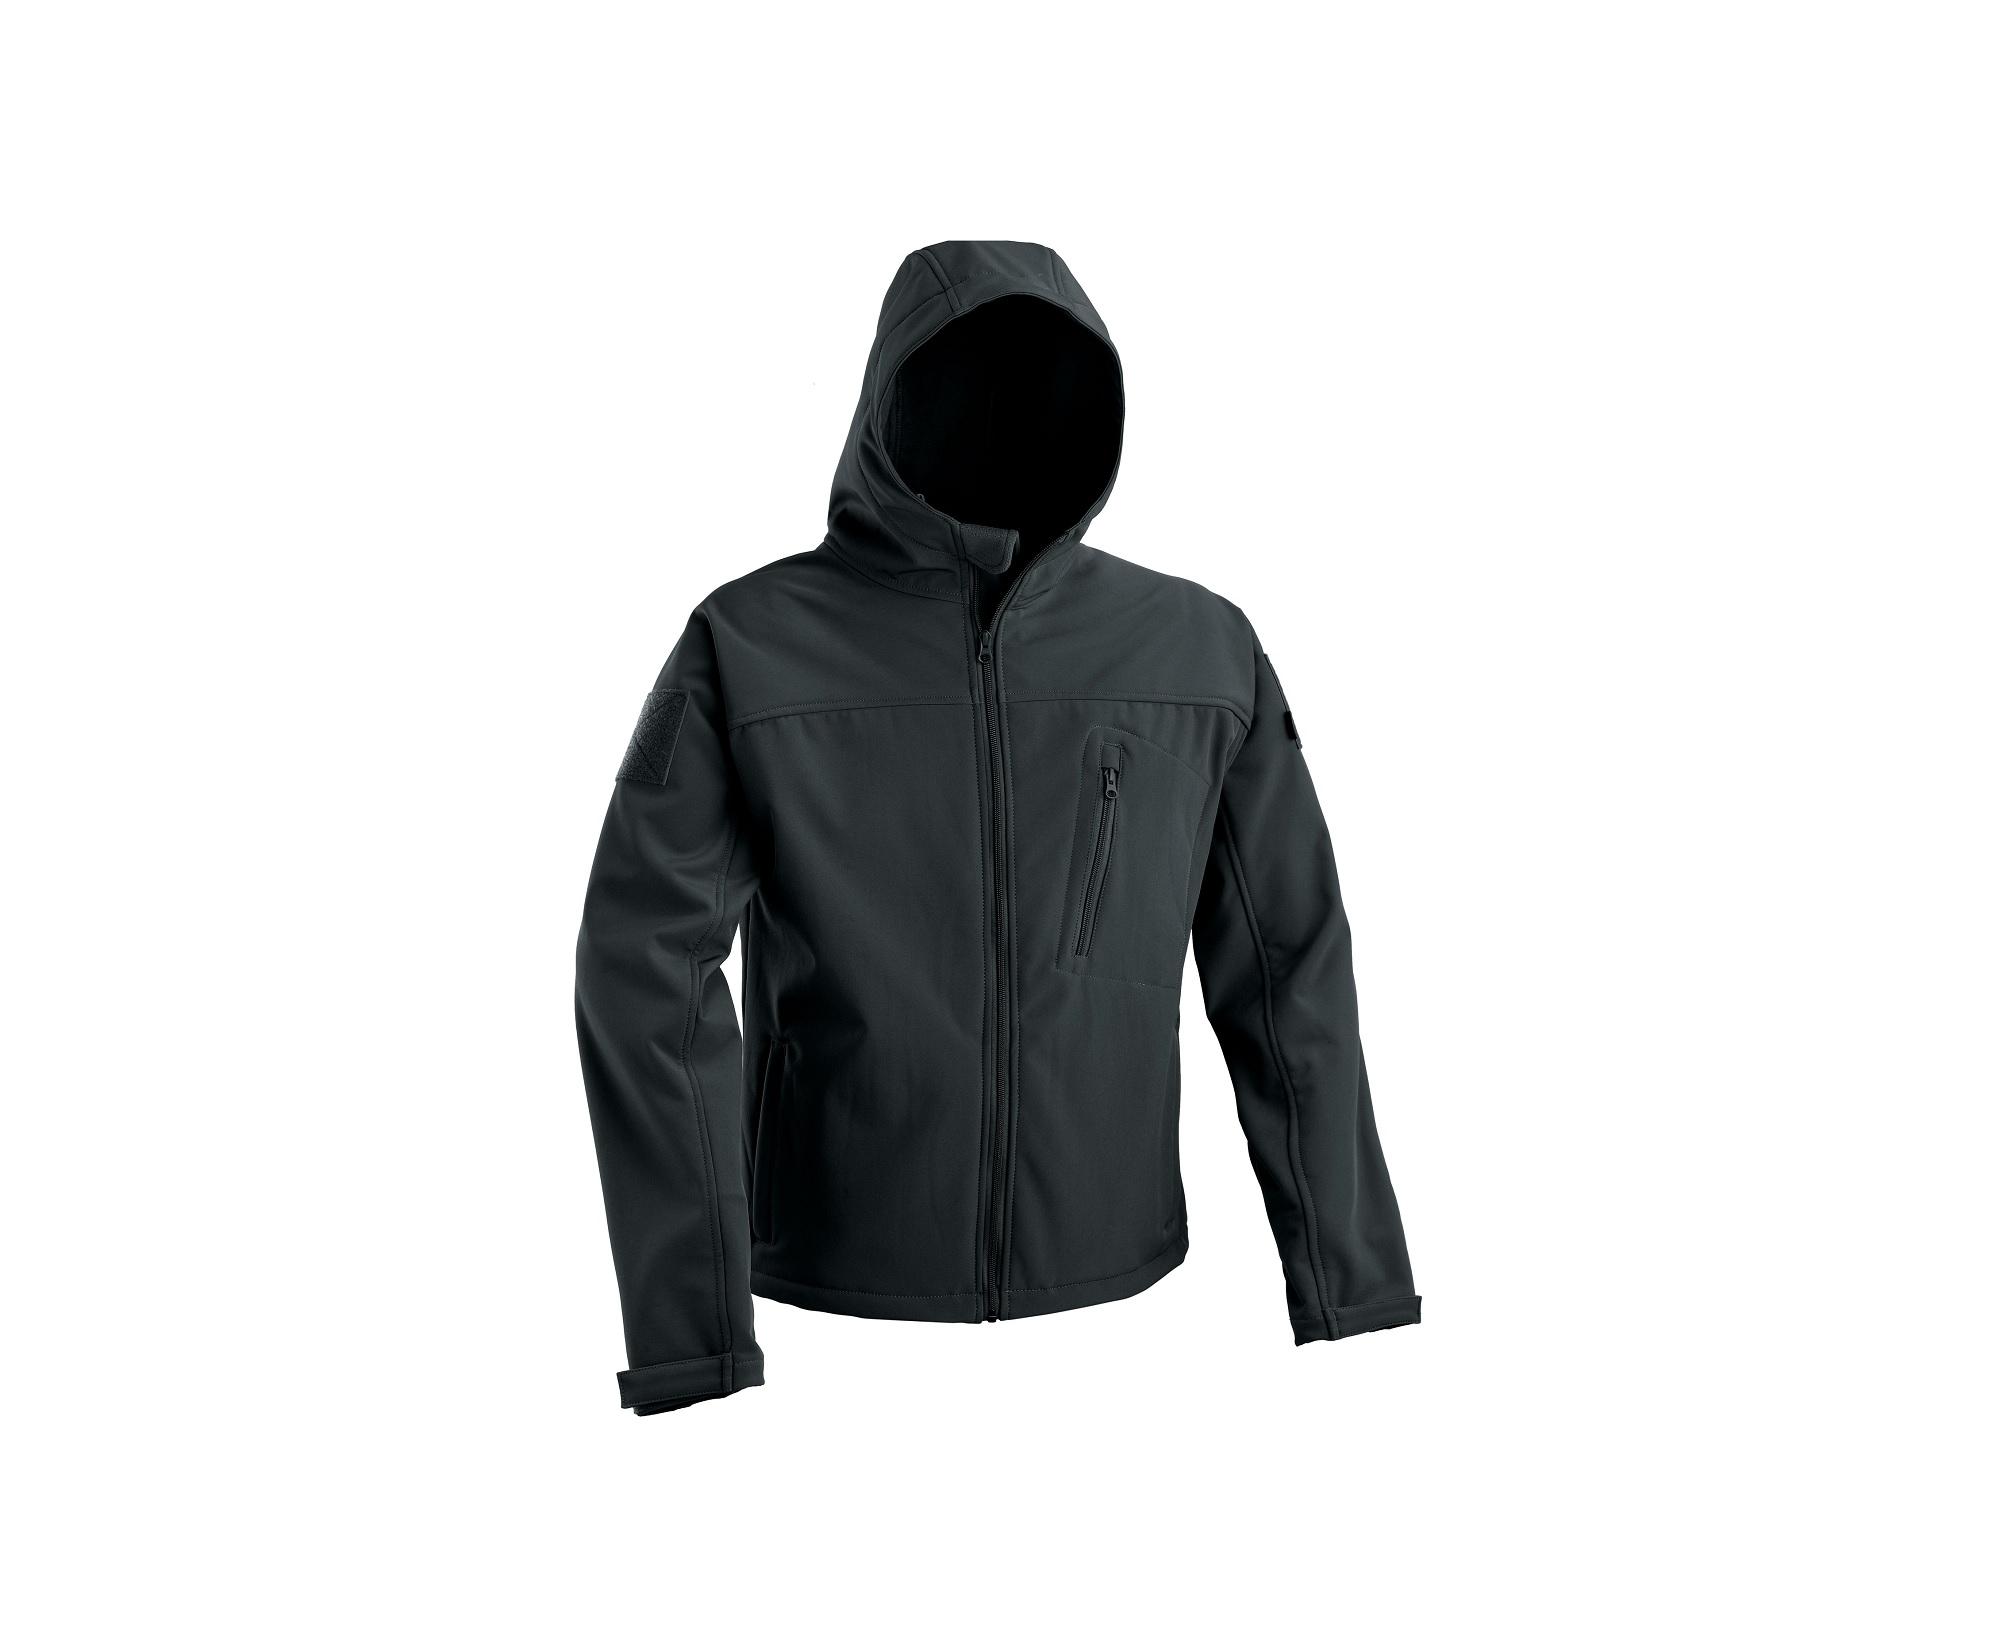 Soft Shell Jacket With Fixed Hood - Black imagine